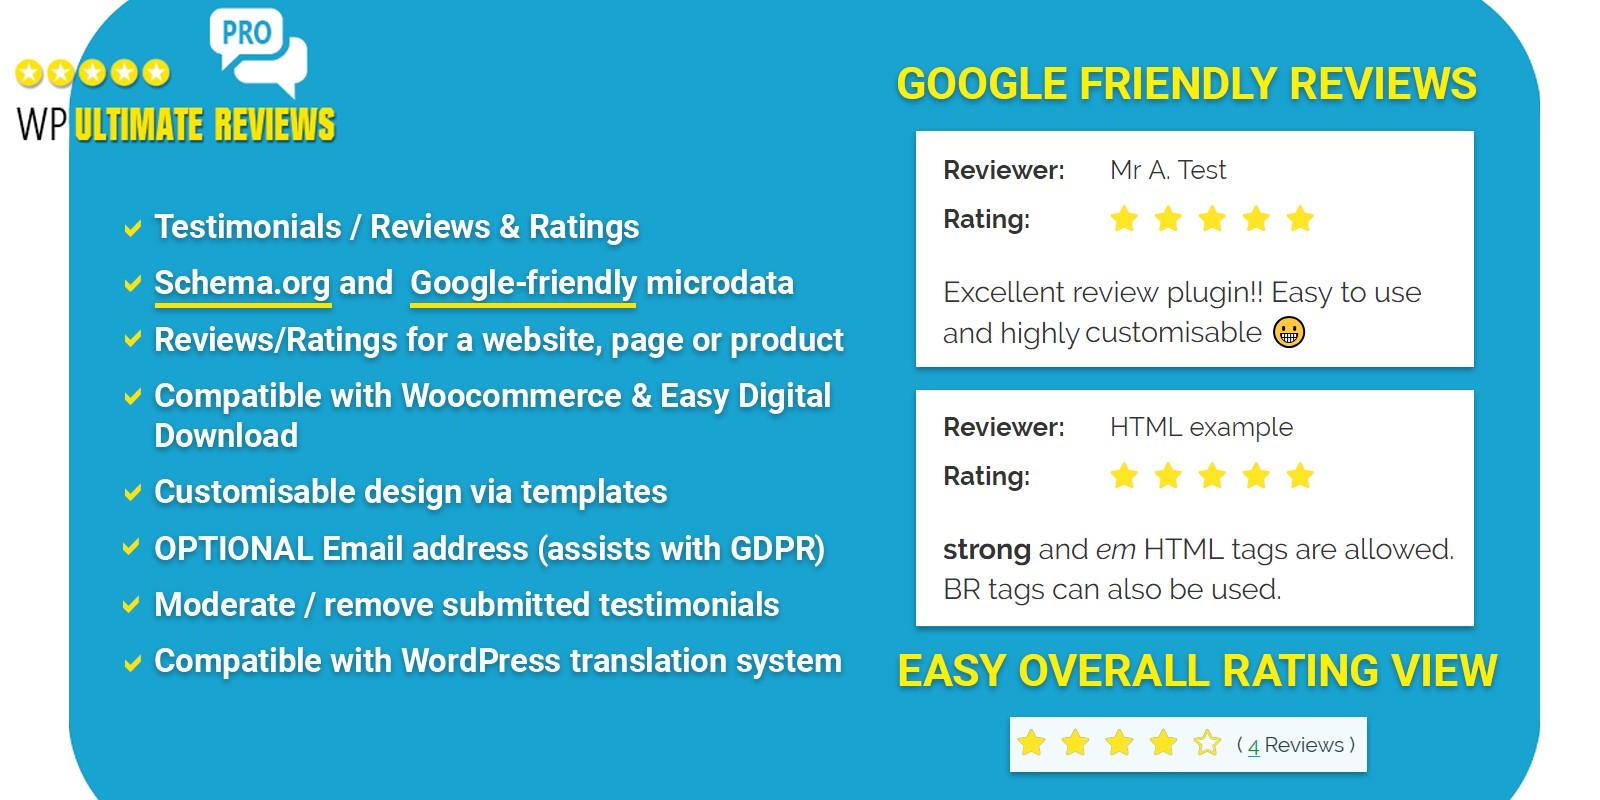 WP Ultimate Reviews Pro - WordPress Plugin